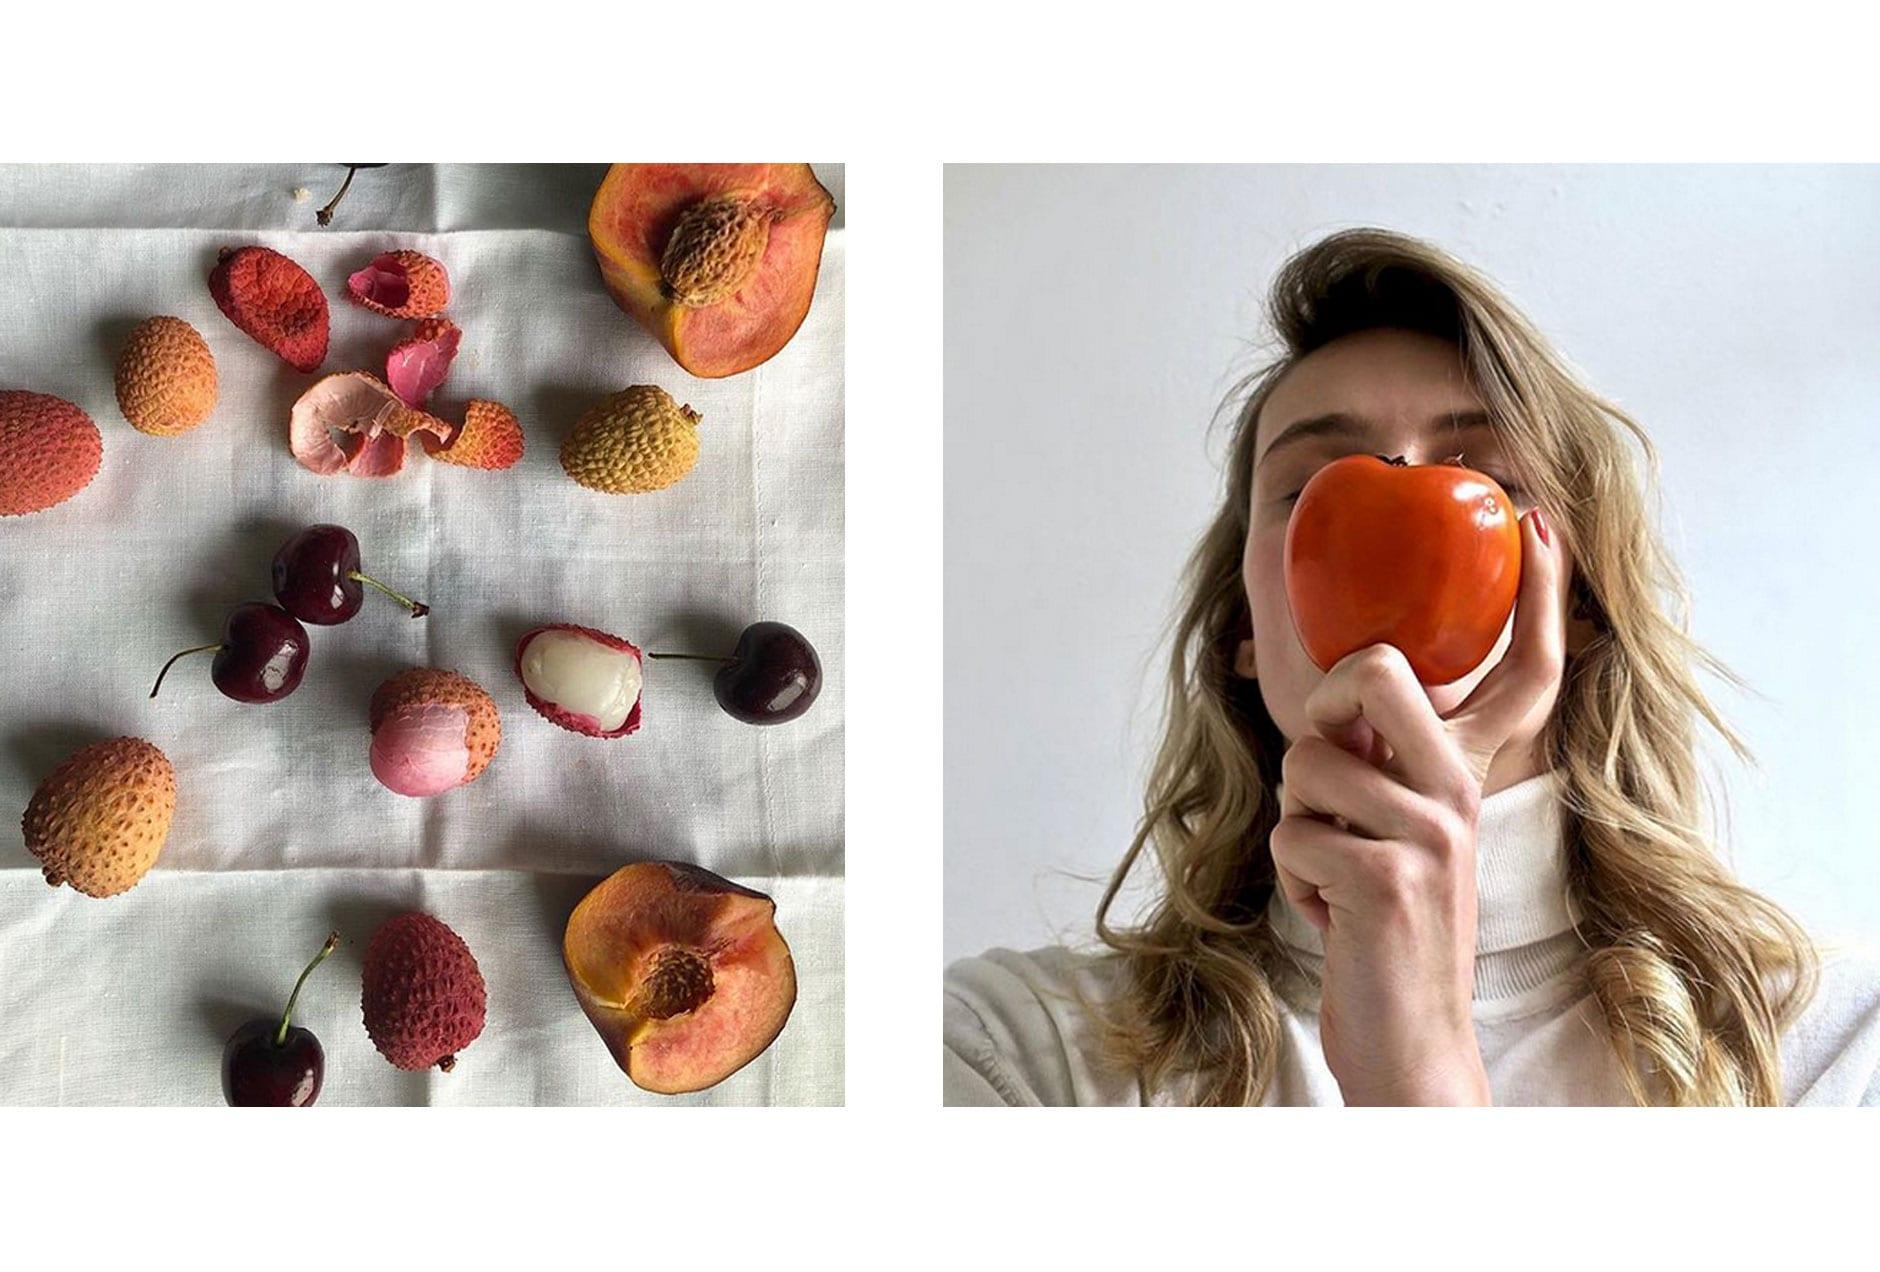 FRUIT_evaisabellaa_stefvanderlaan